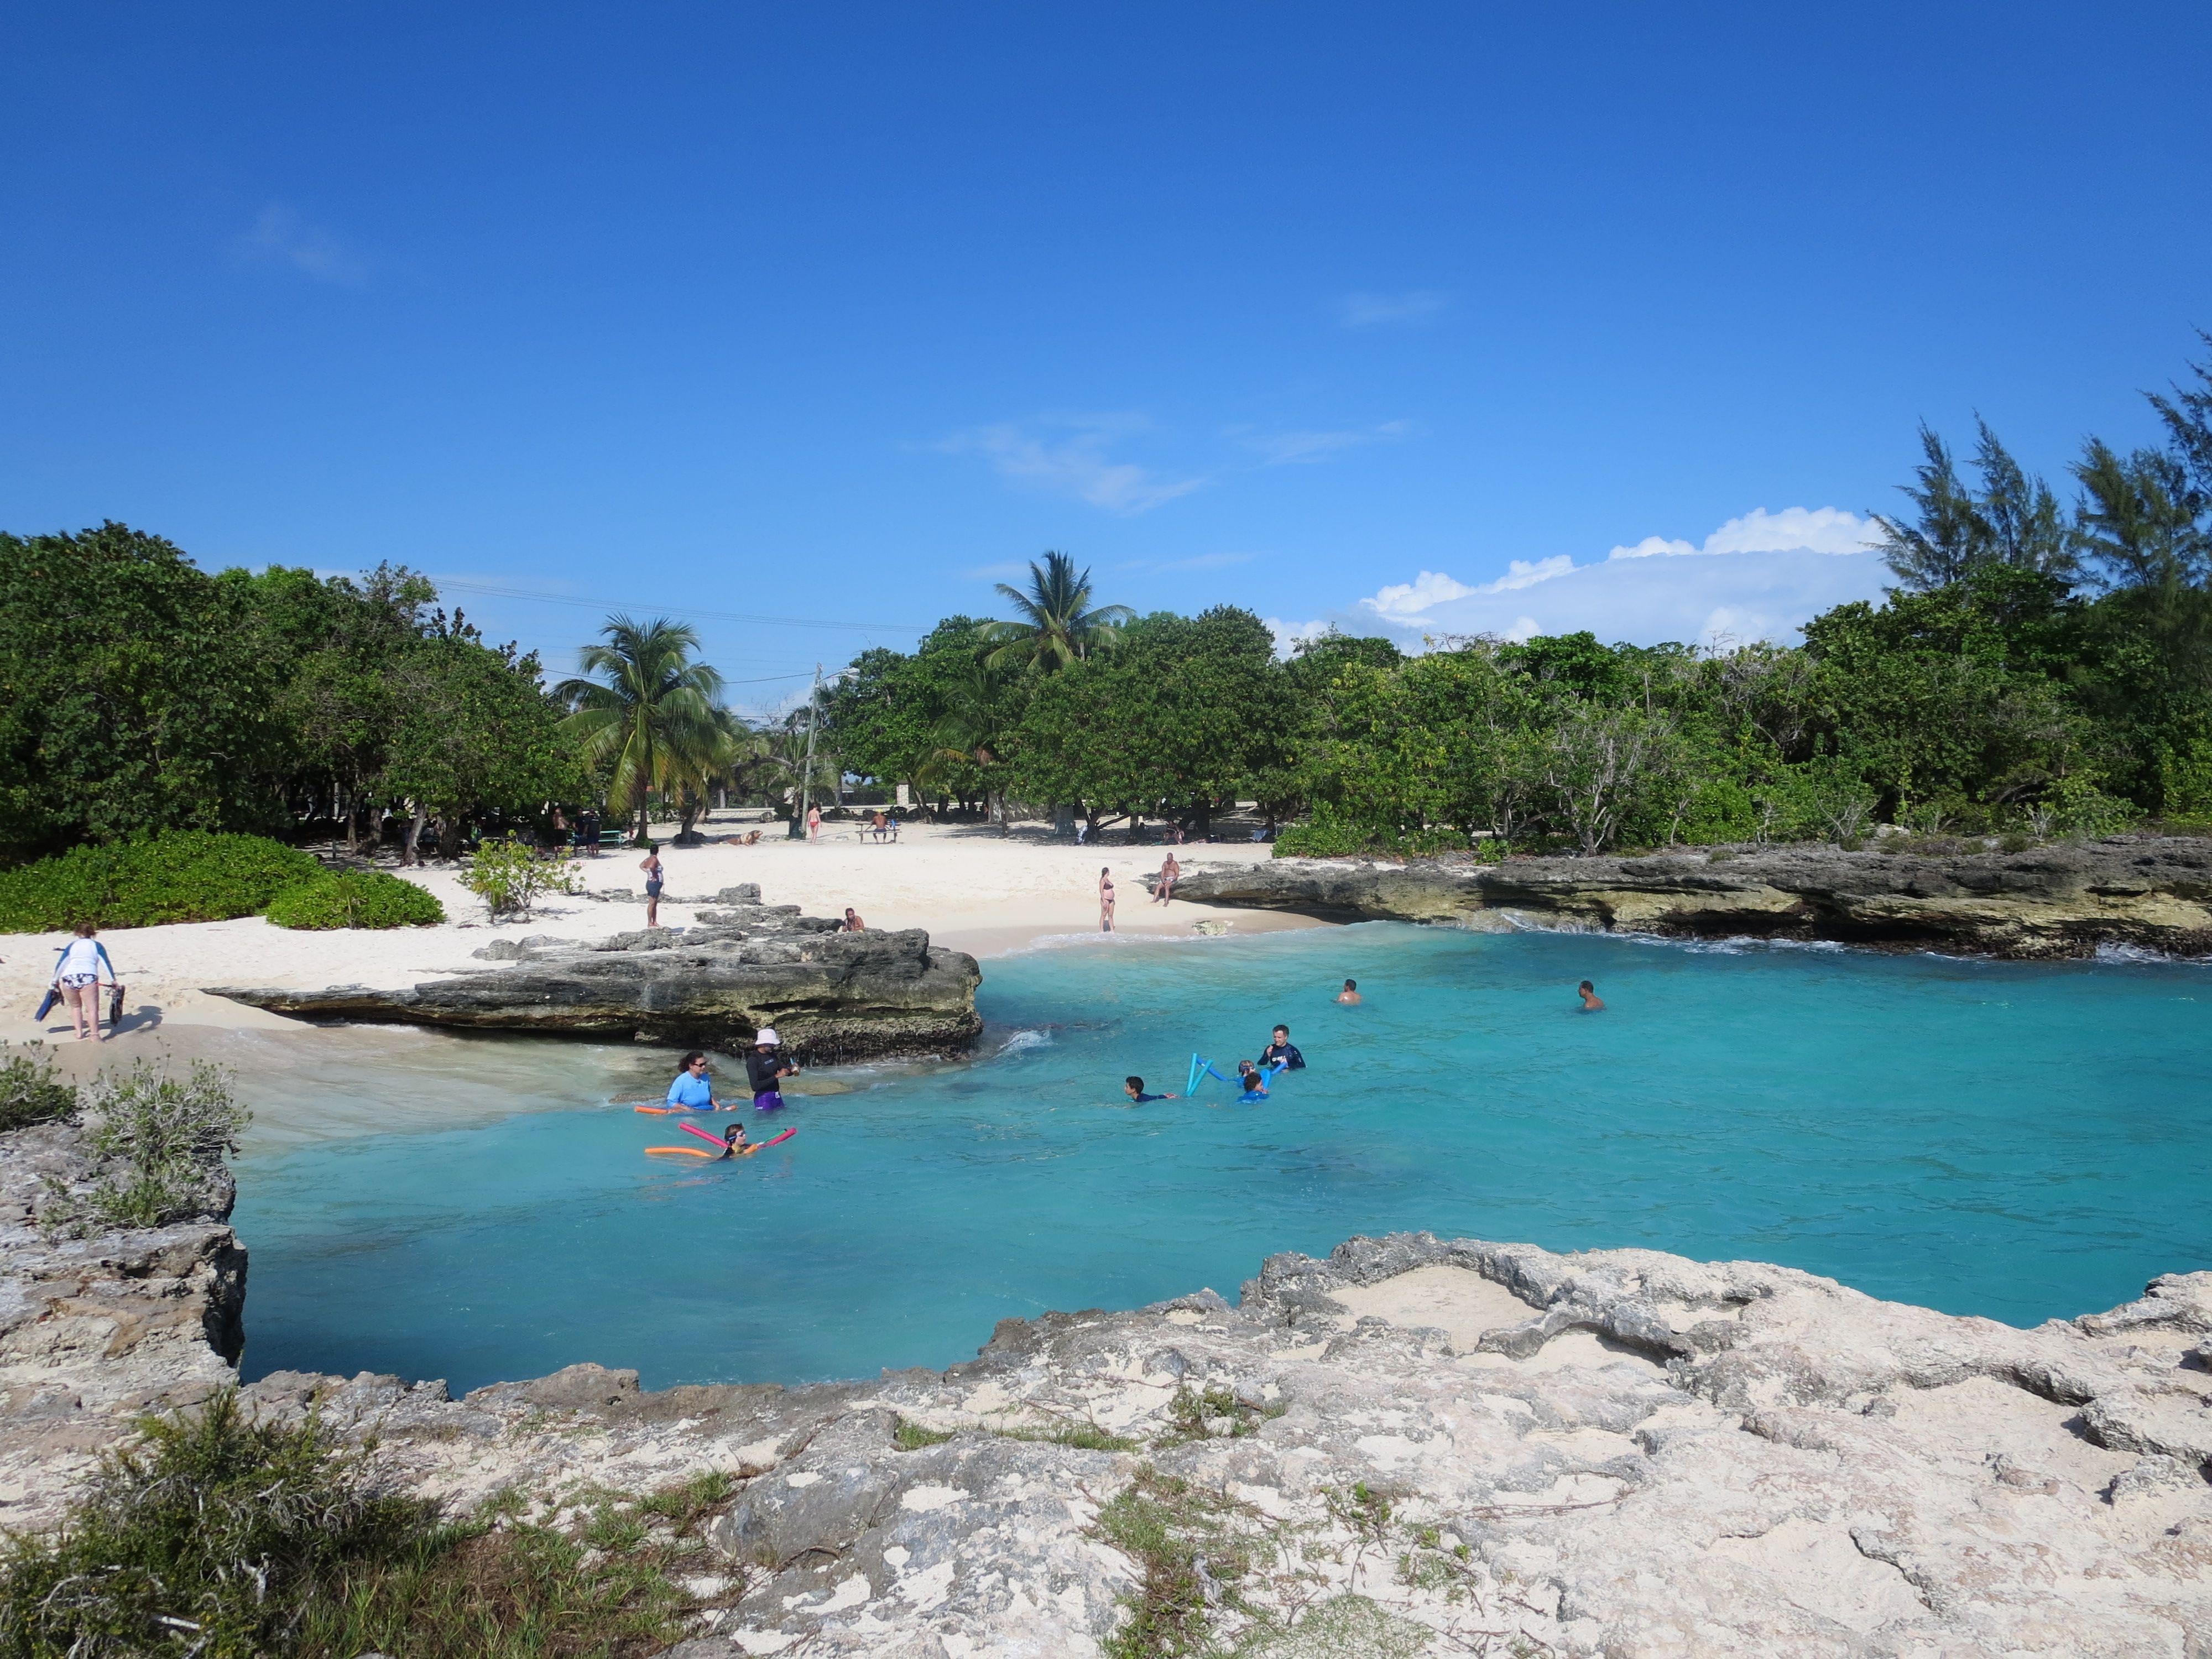 Sunset Cove Cayman Islands